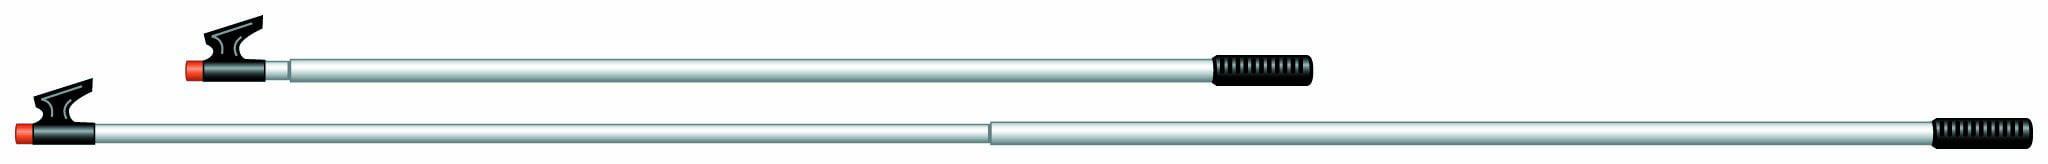 New Telescoping Boat Hook garelick 55190:02 Length 4/' to 7.5/'